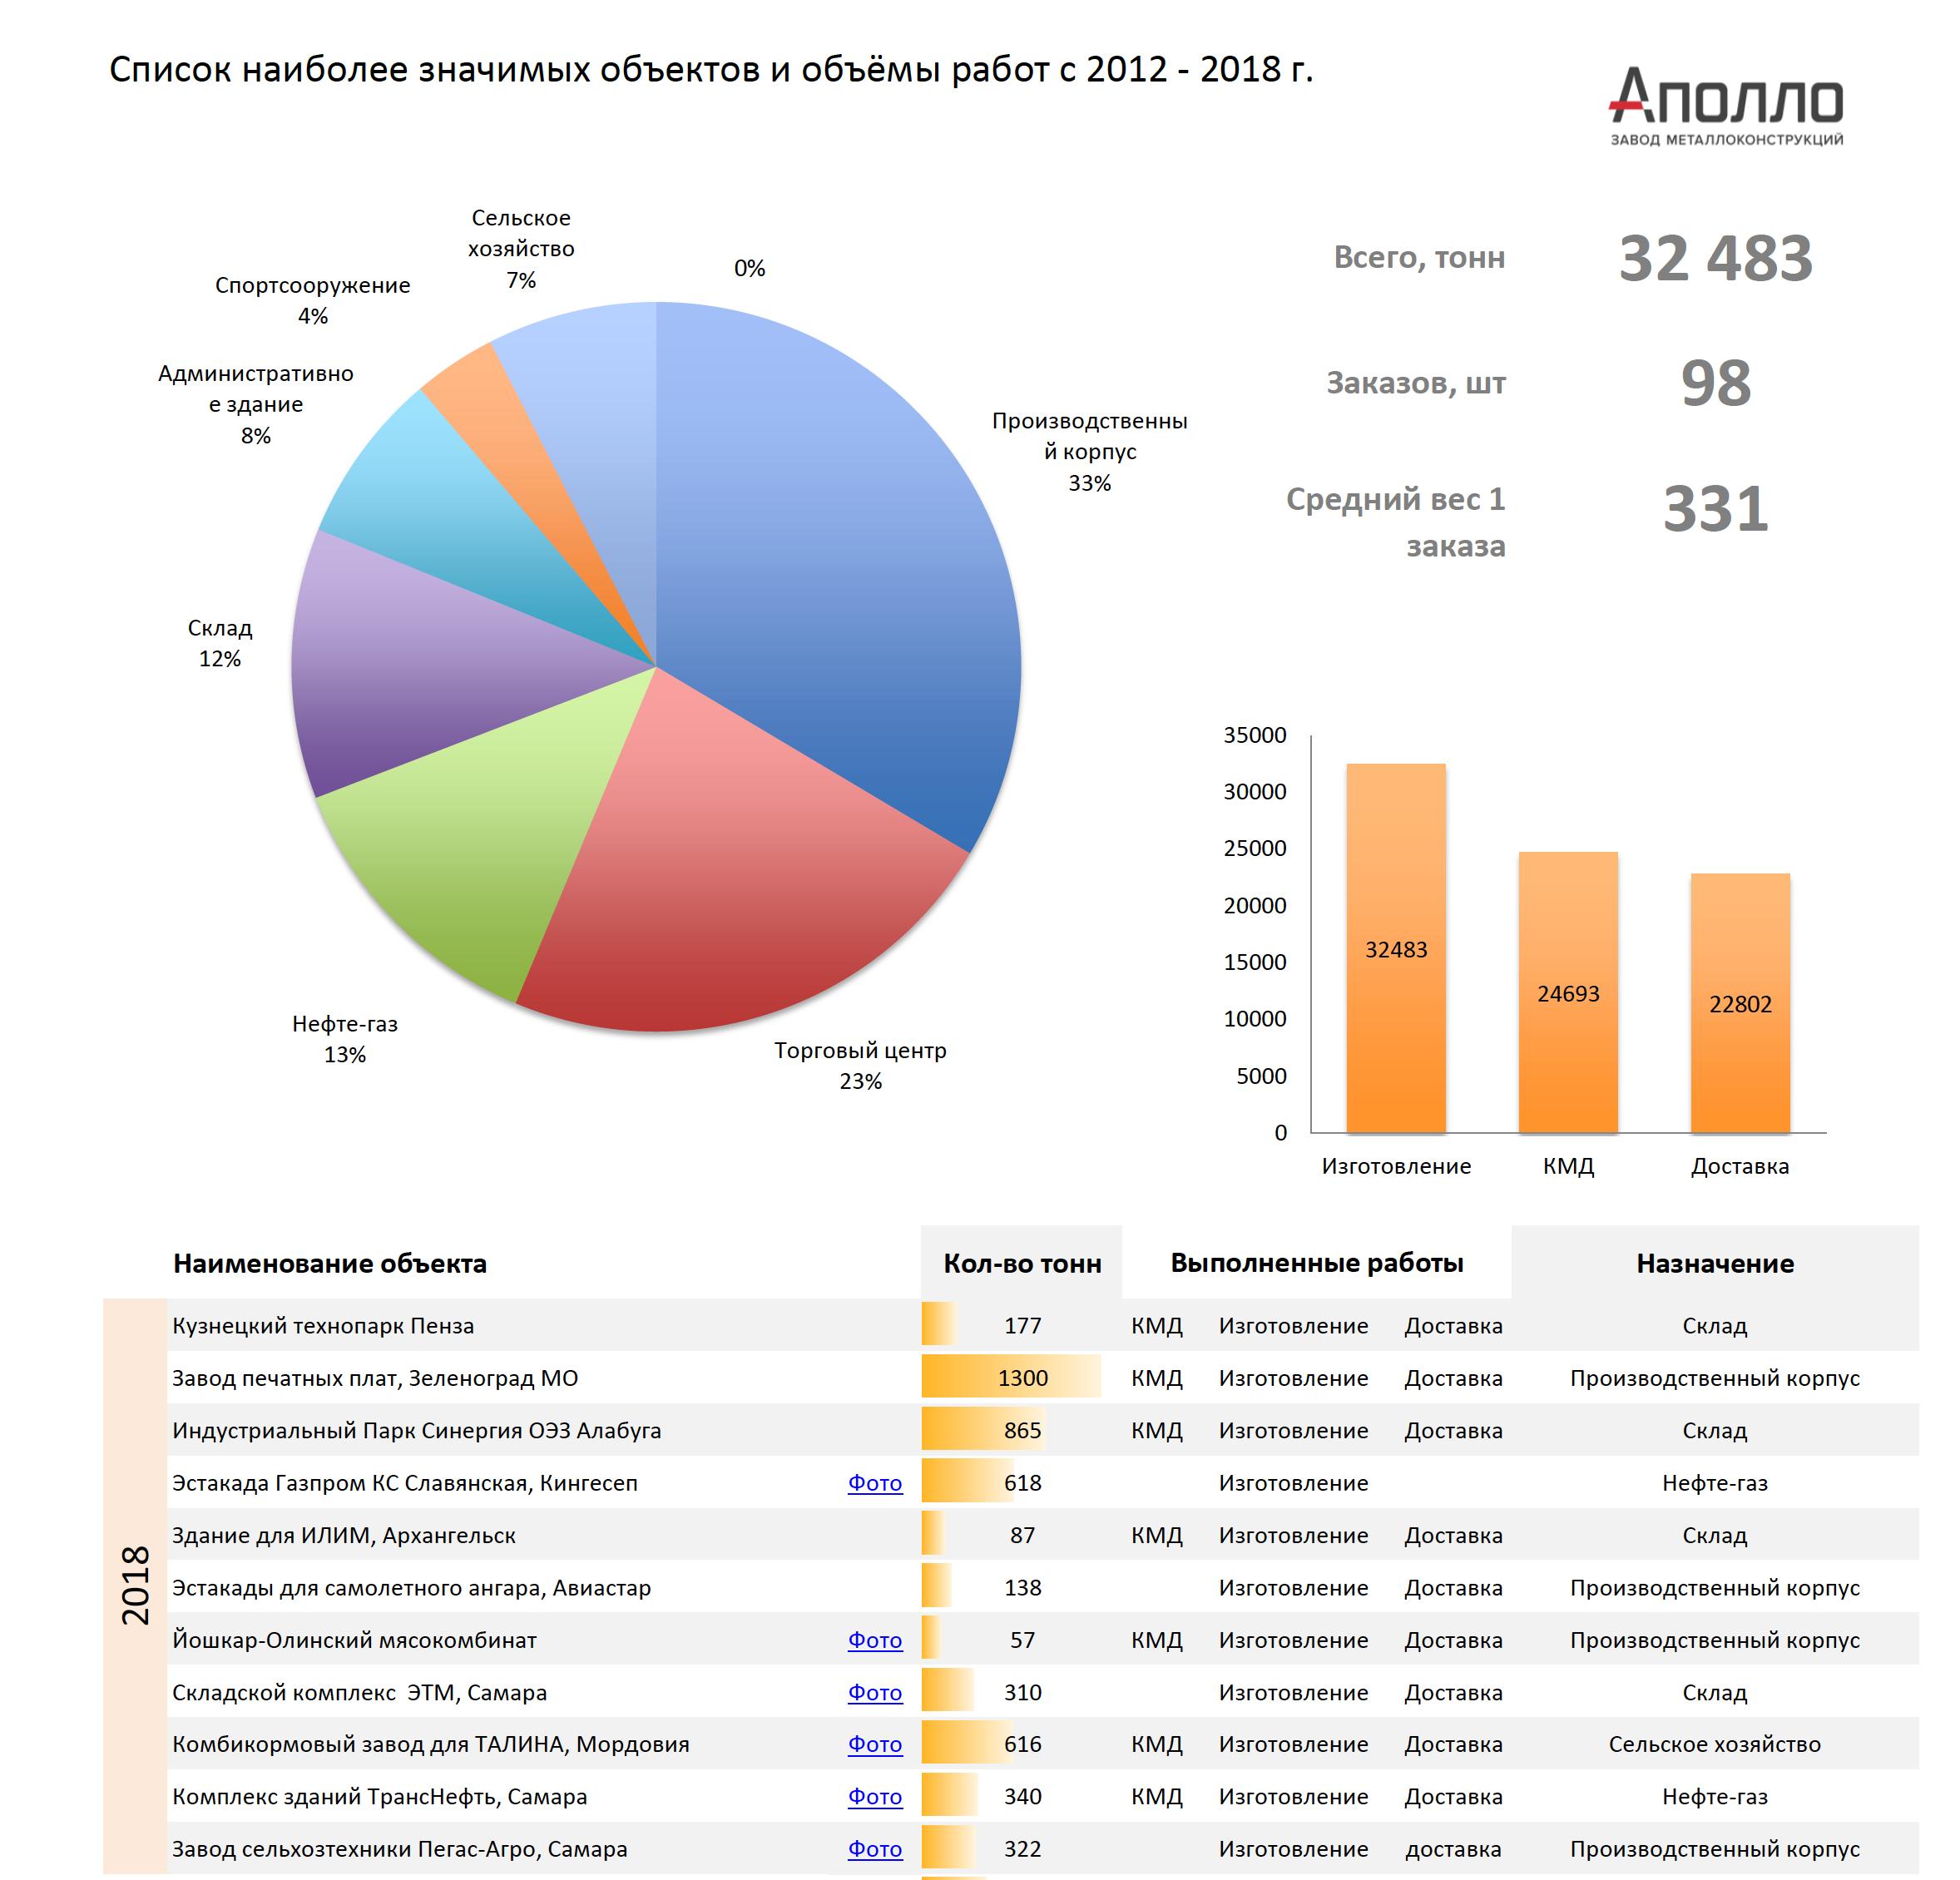 Референц-лист ЗМК Аполло 2012-2017 год